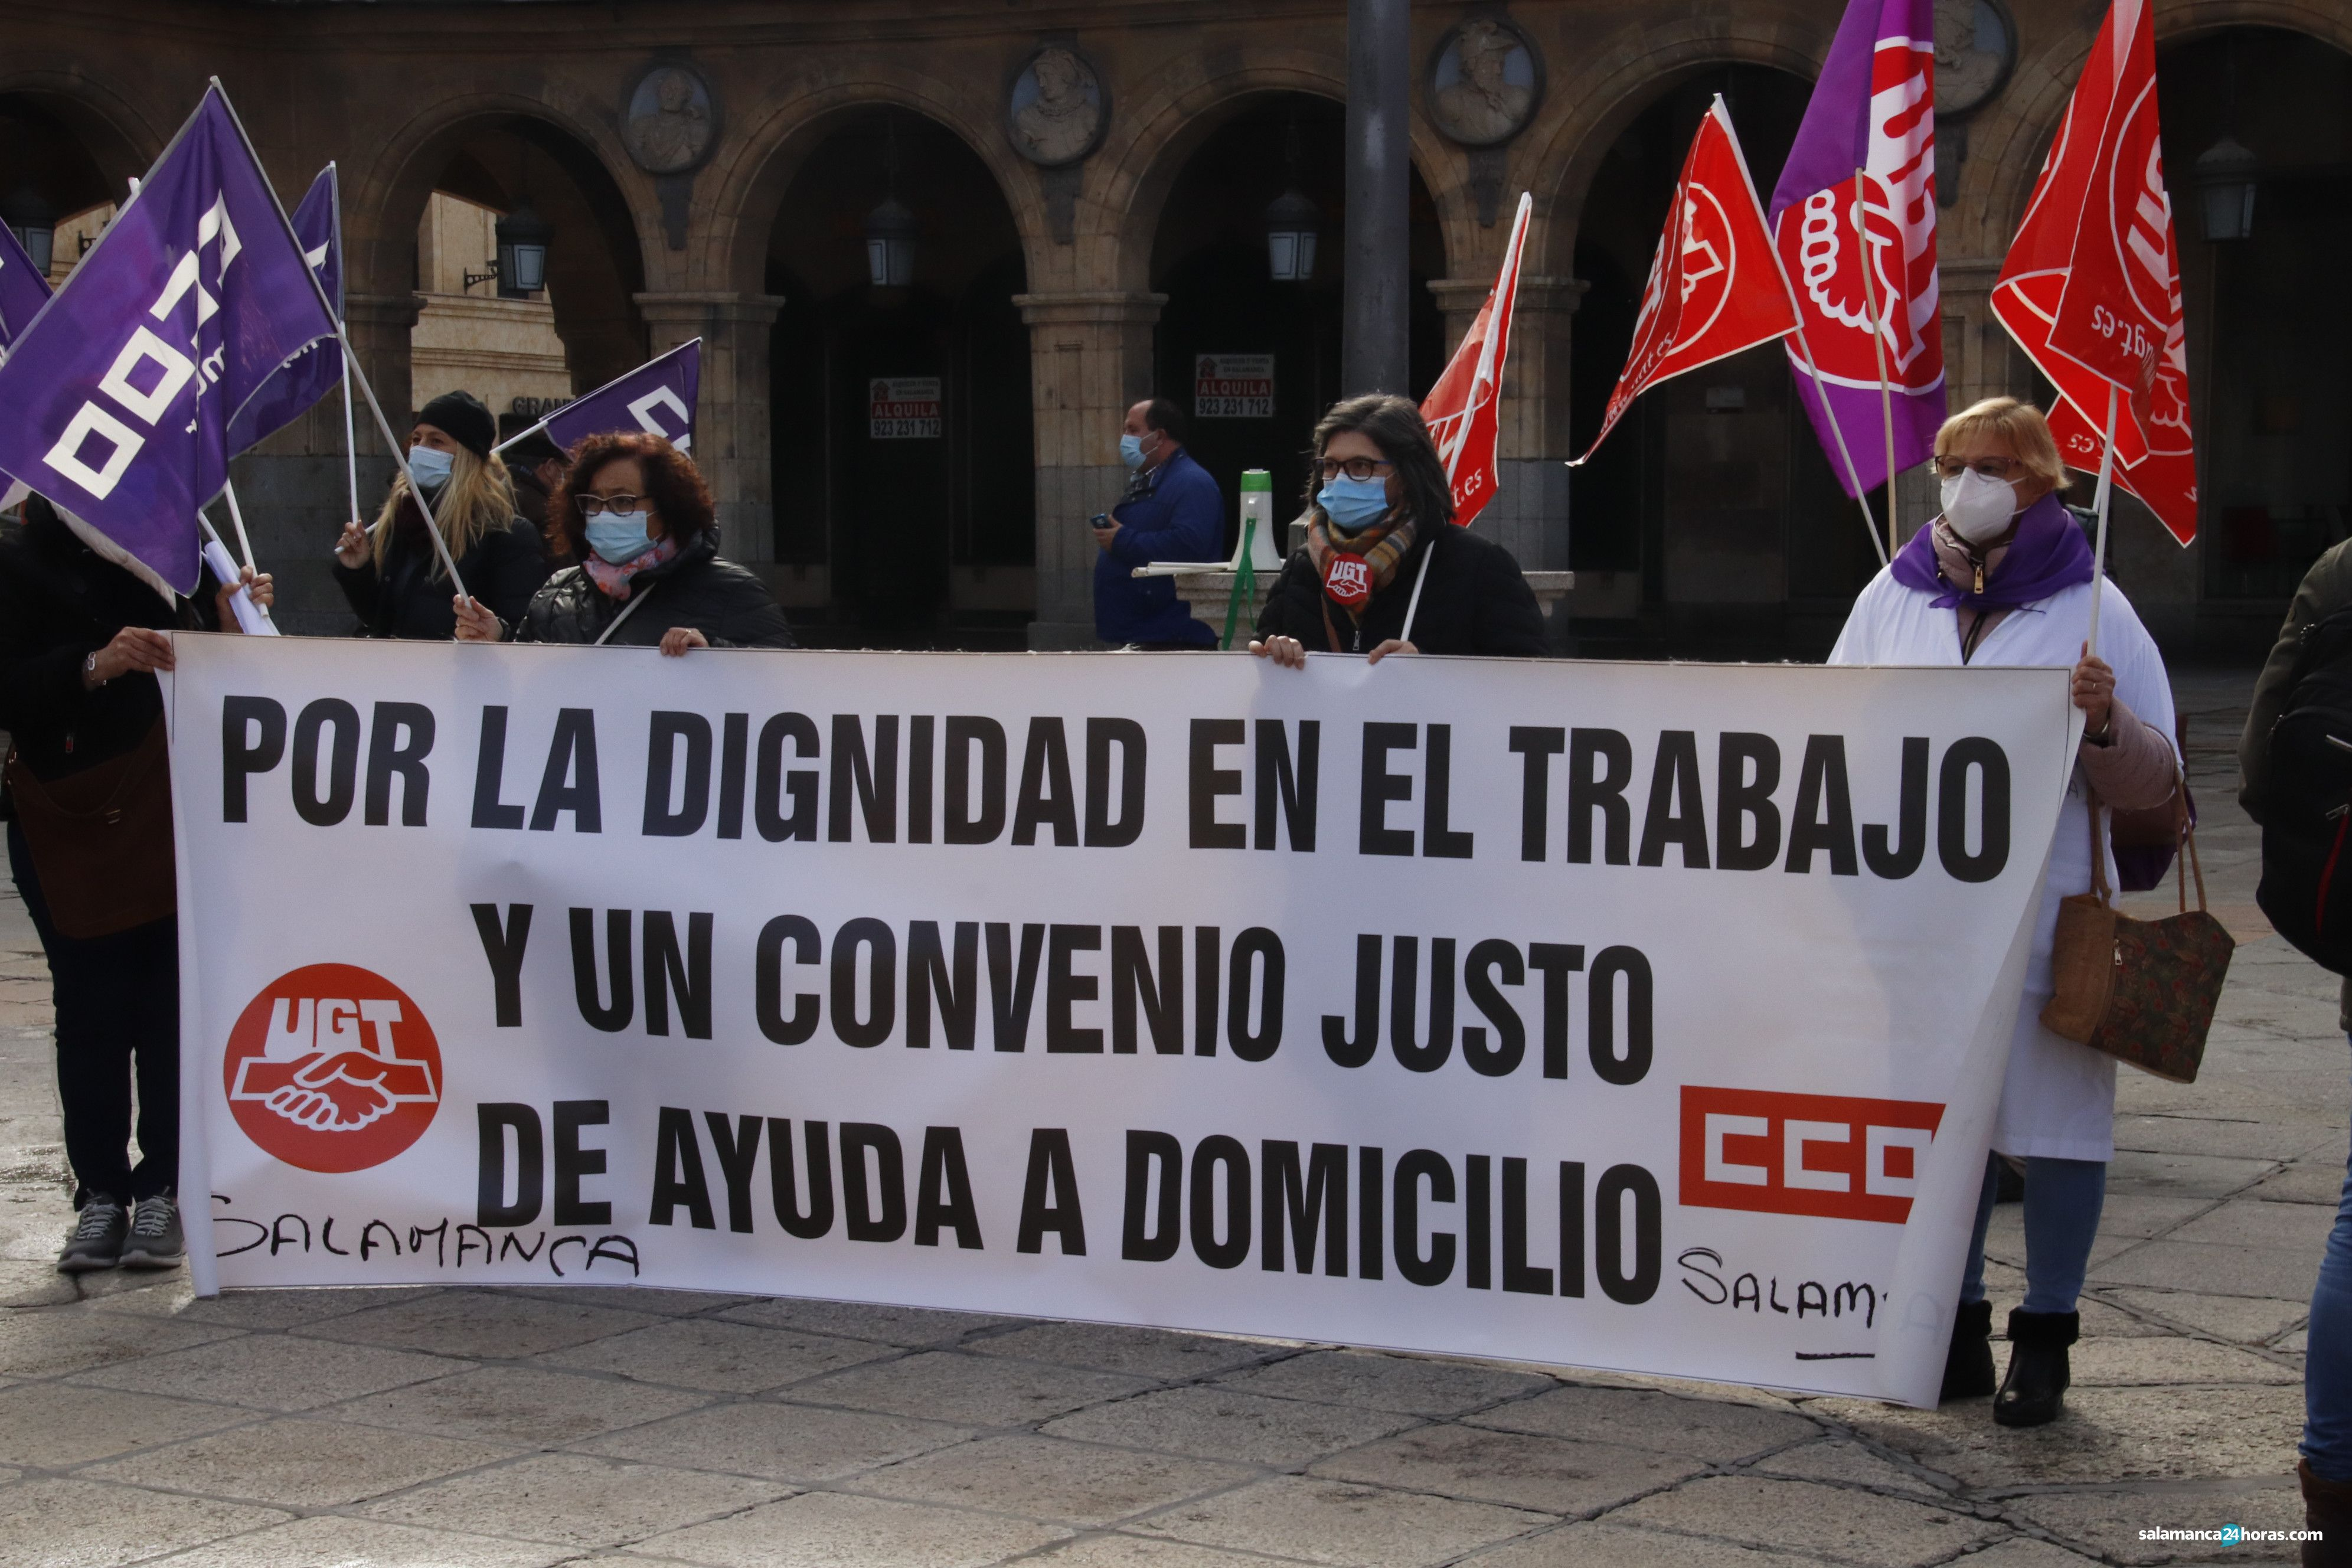 Manifestacion ugt plaza (3)